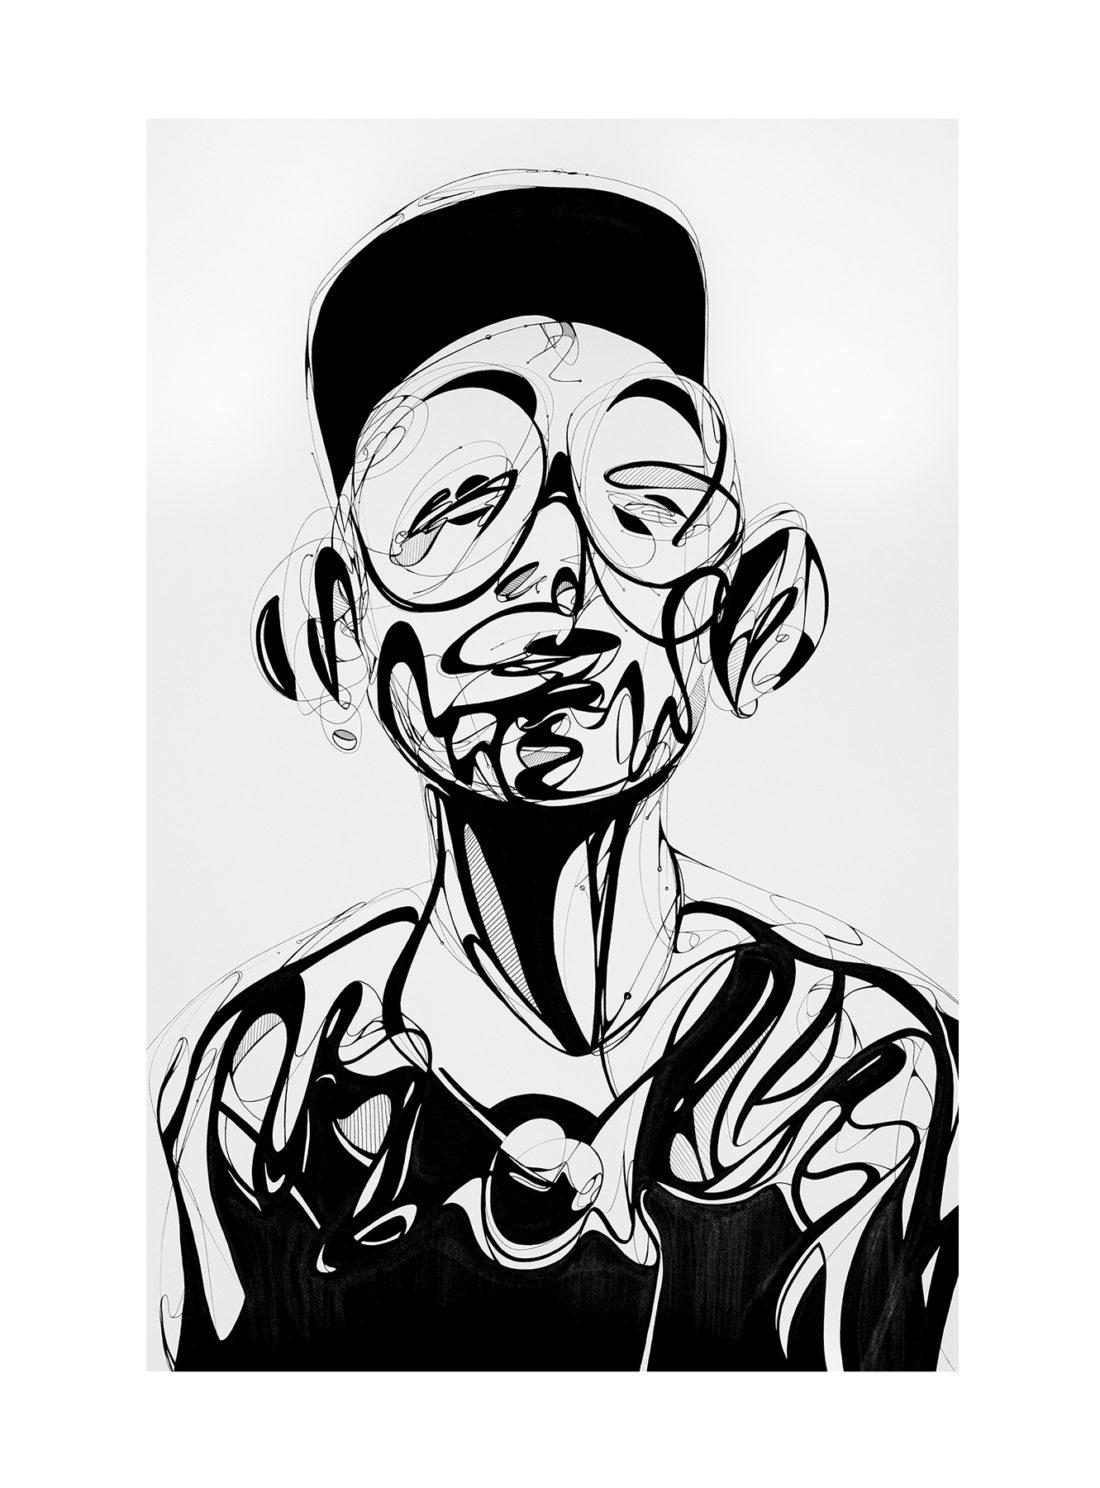 Untitled #91 (Stateless) - Martin Kalanda